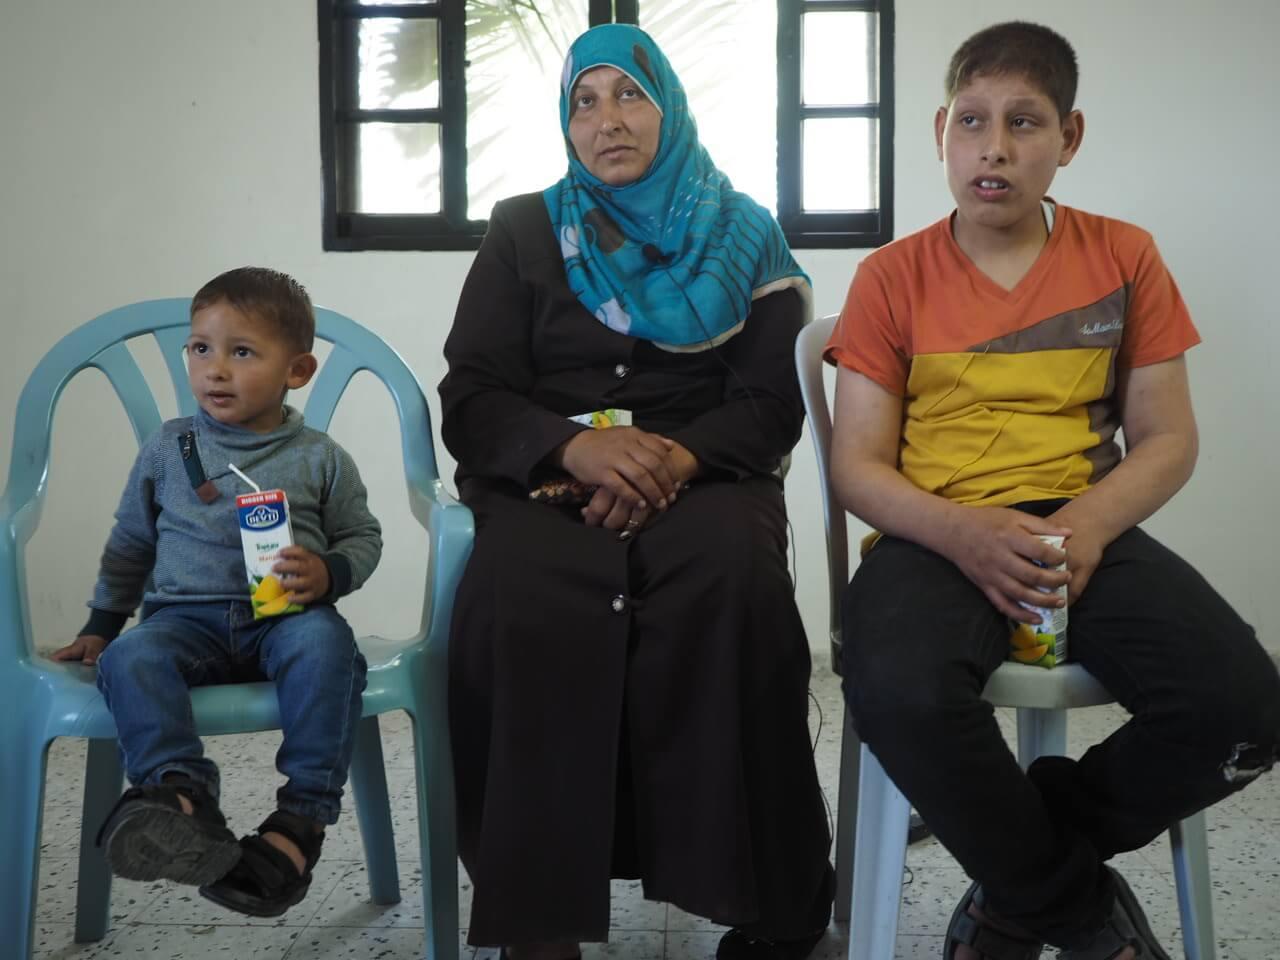 Um Ahmad Najjar and her two sons Rayan and Ahmad. (Photo: Dan Cohen)